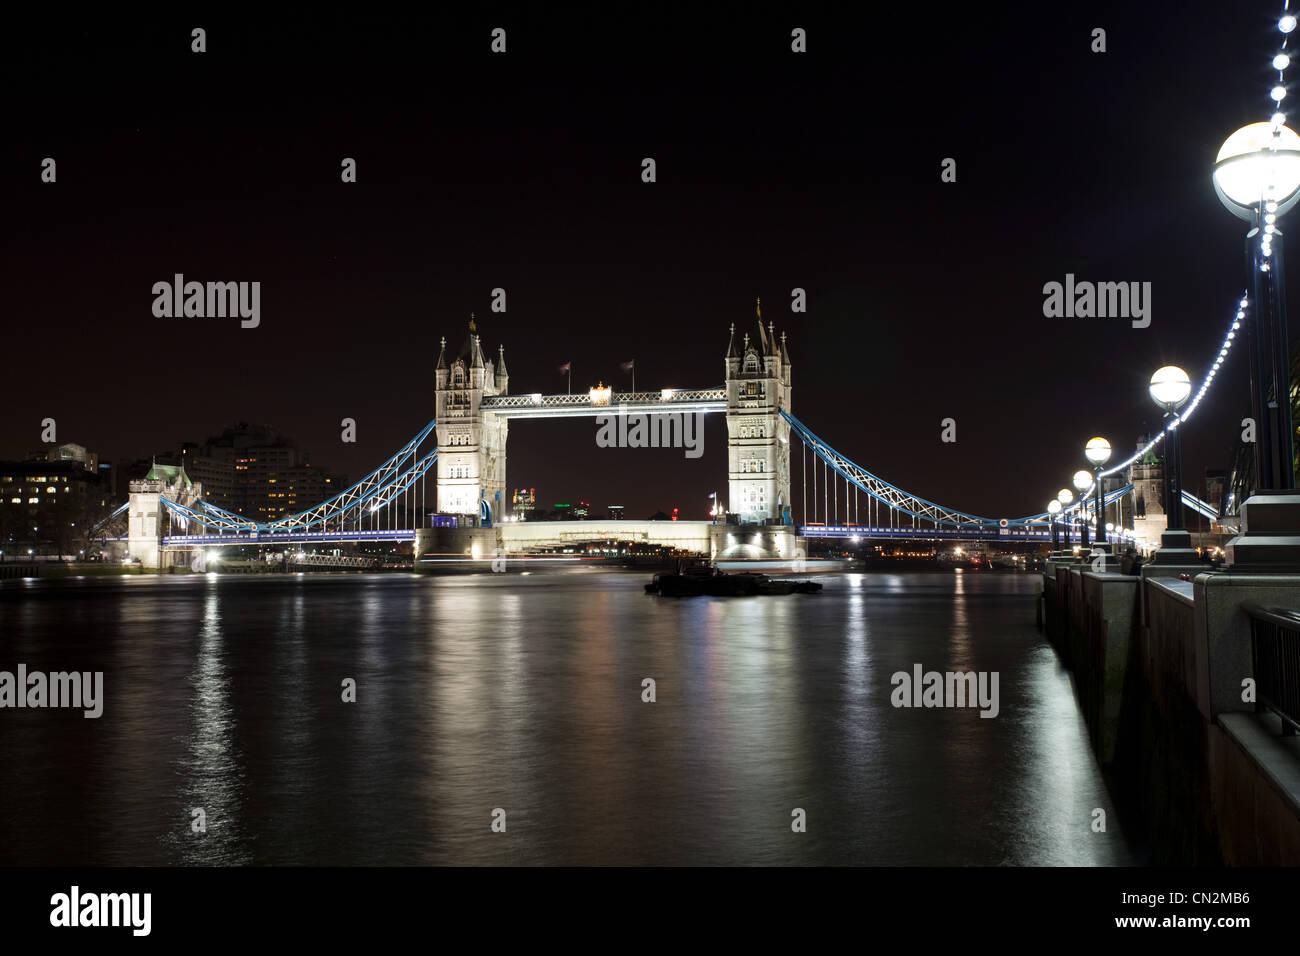 Tower Bridge über die Themse, London, UK Stockbild